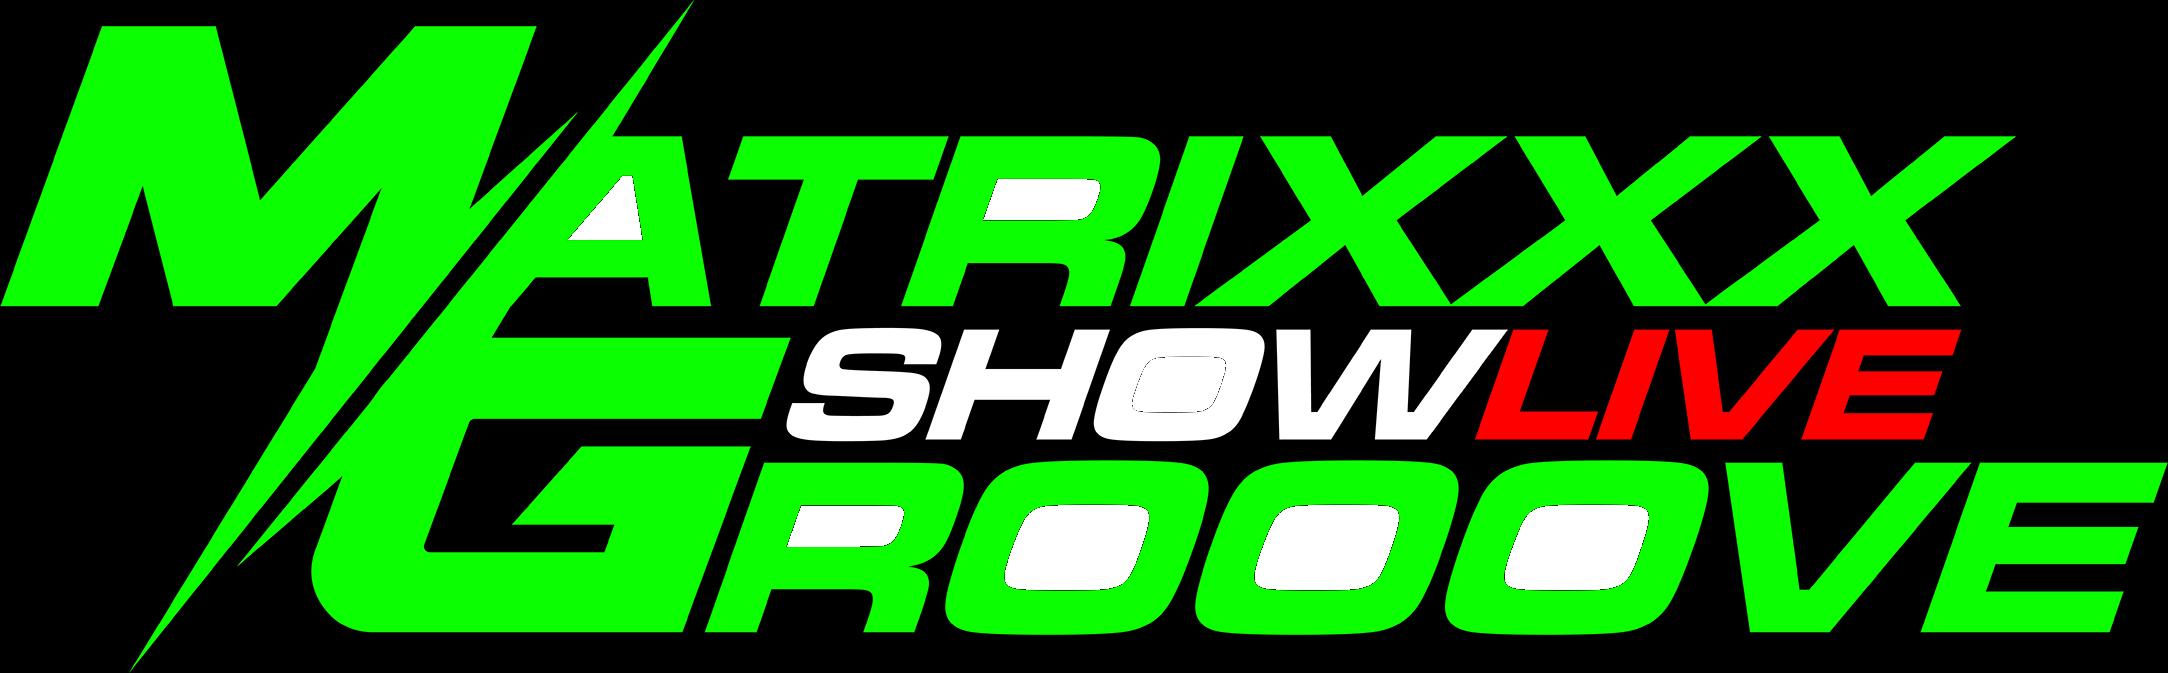 MG Show logo